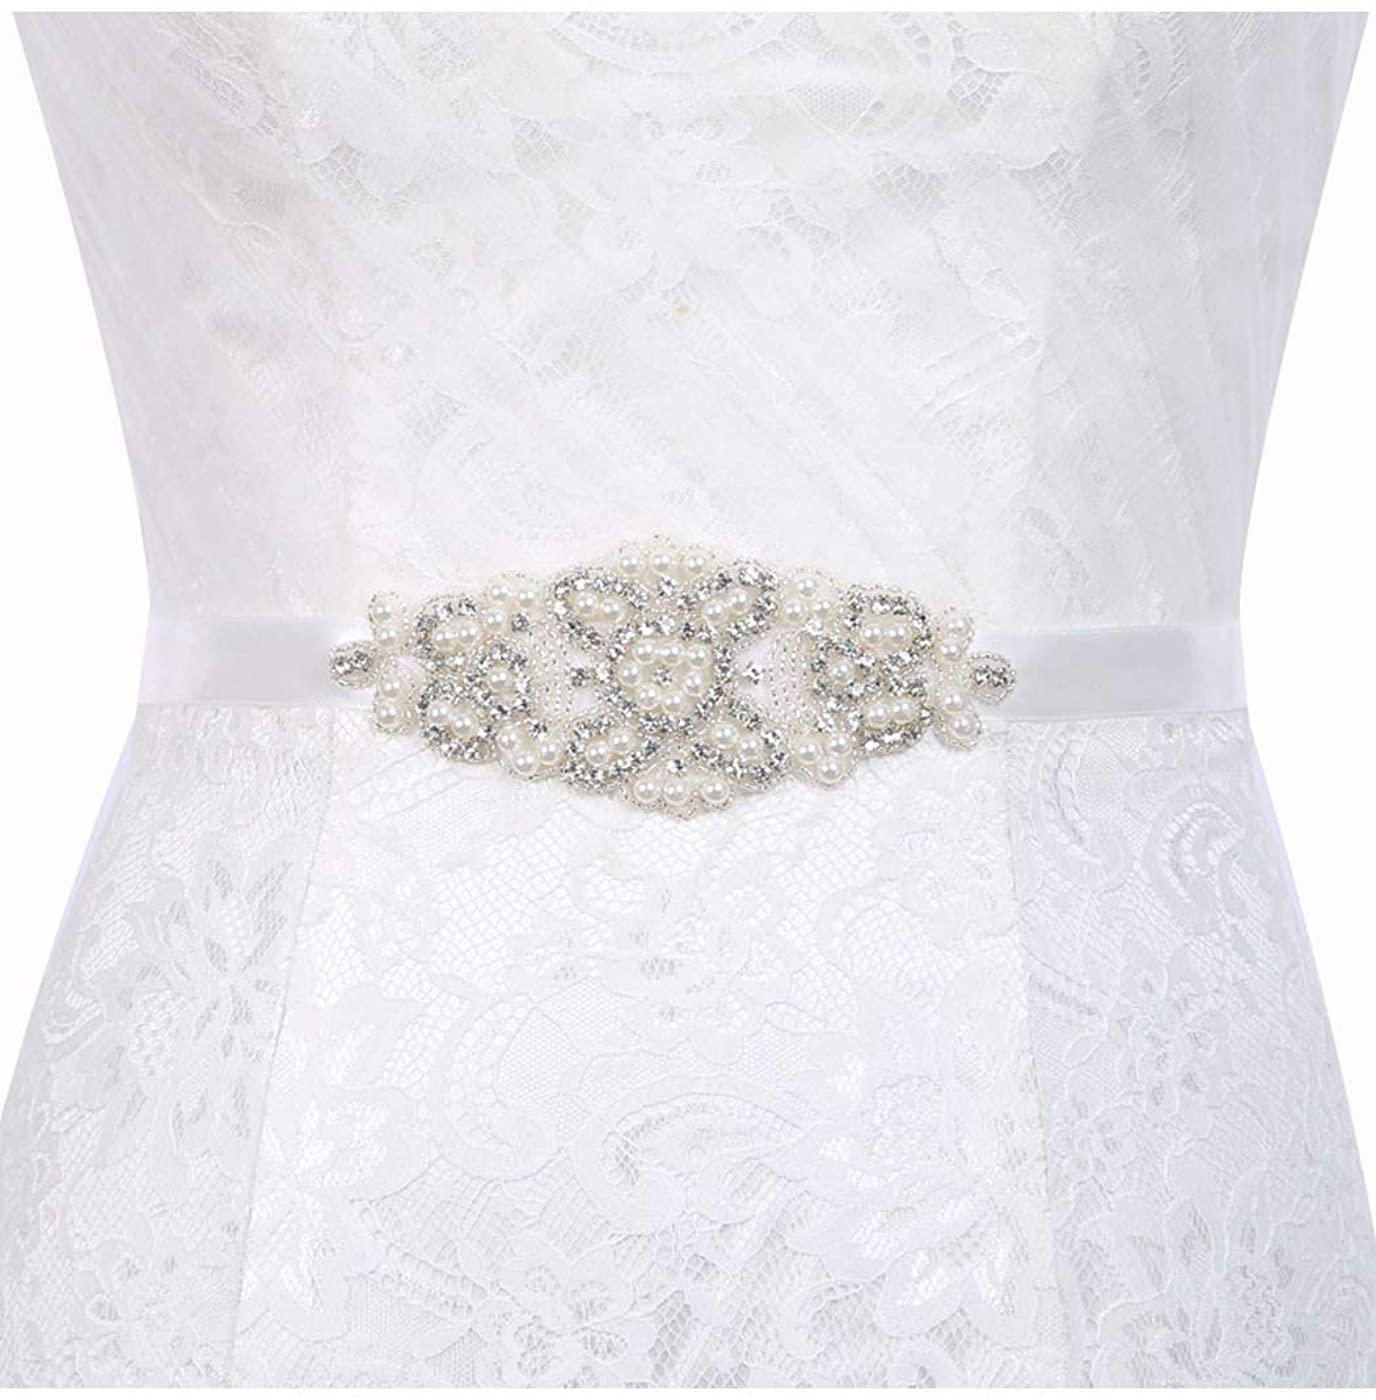 Brishow Handmade Rhinestone Bride Belts Silver Crystal Wedding Bridal Belt Sashes Beaded Belt for Women Dress Accessories